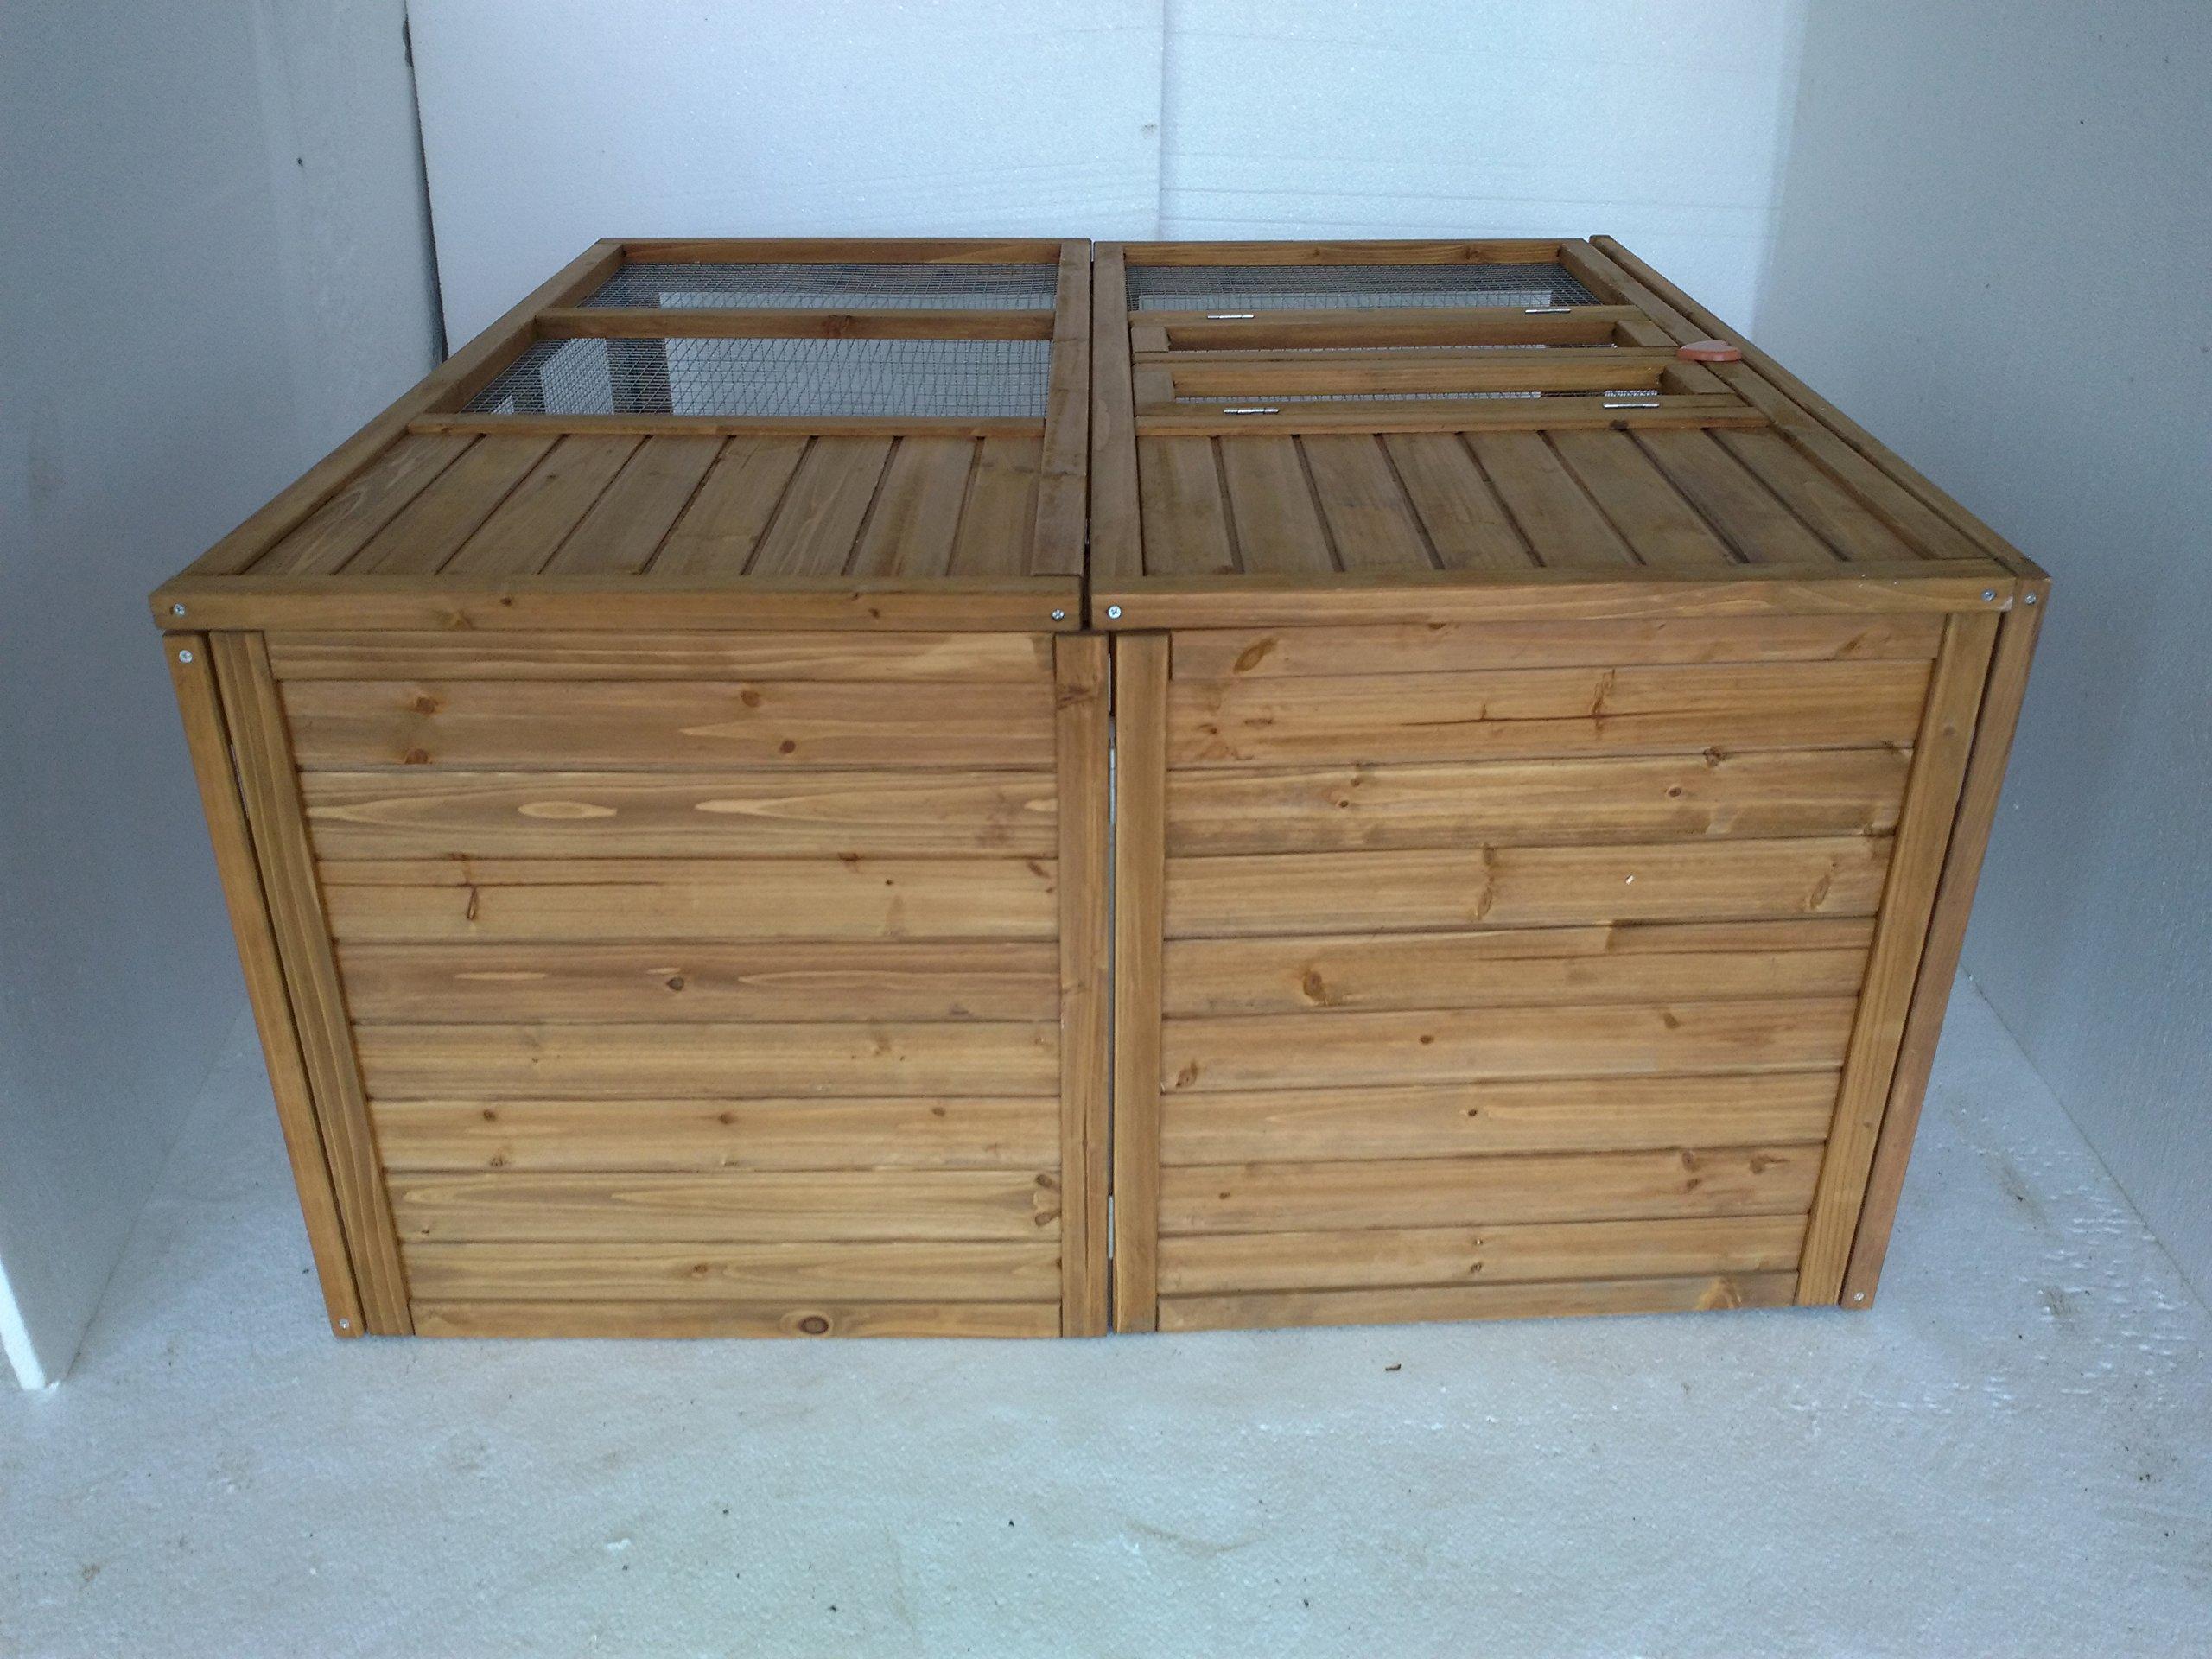 Exacme Lovupet 48'' Foldable Wooden Animal Cage Outdoor Chicken Coop Rabbit Pet Hutch Run 6010-0400